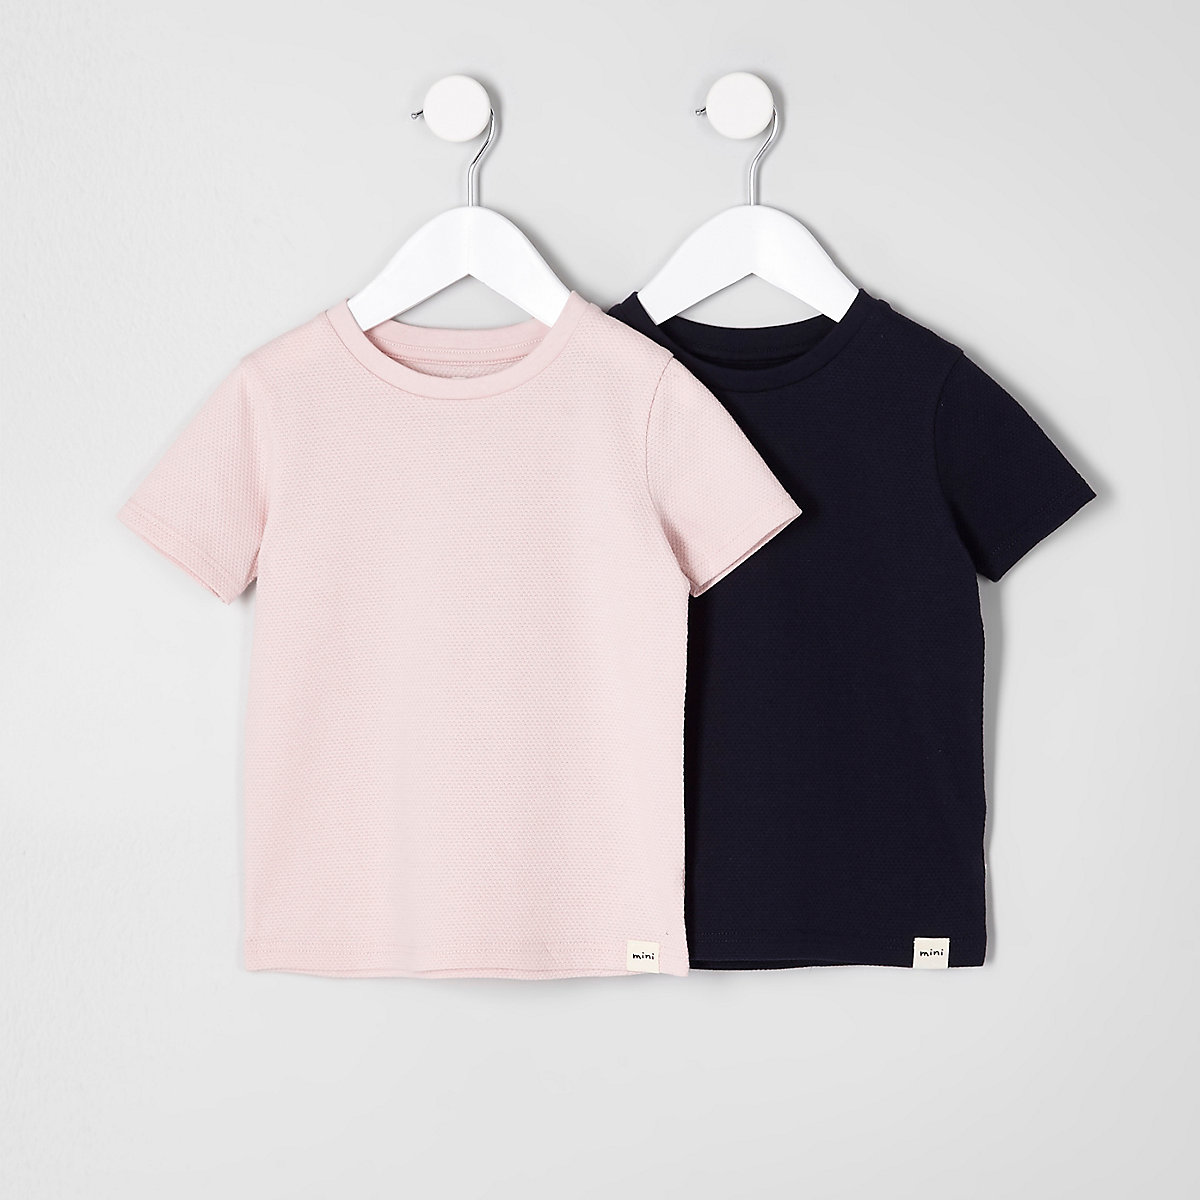 Lot de t-shirts rose et bleu marine texturés mini garçon